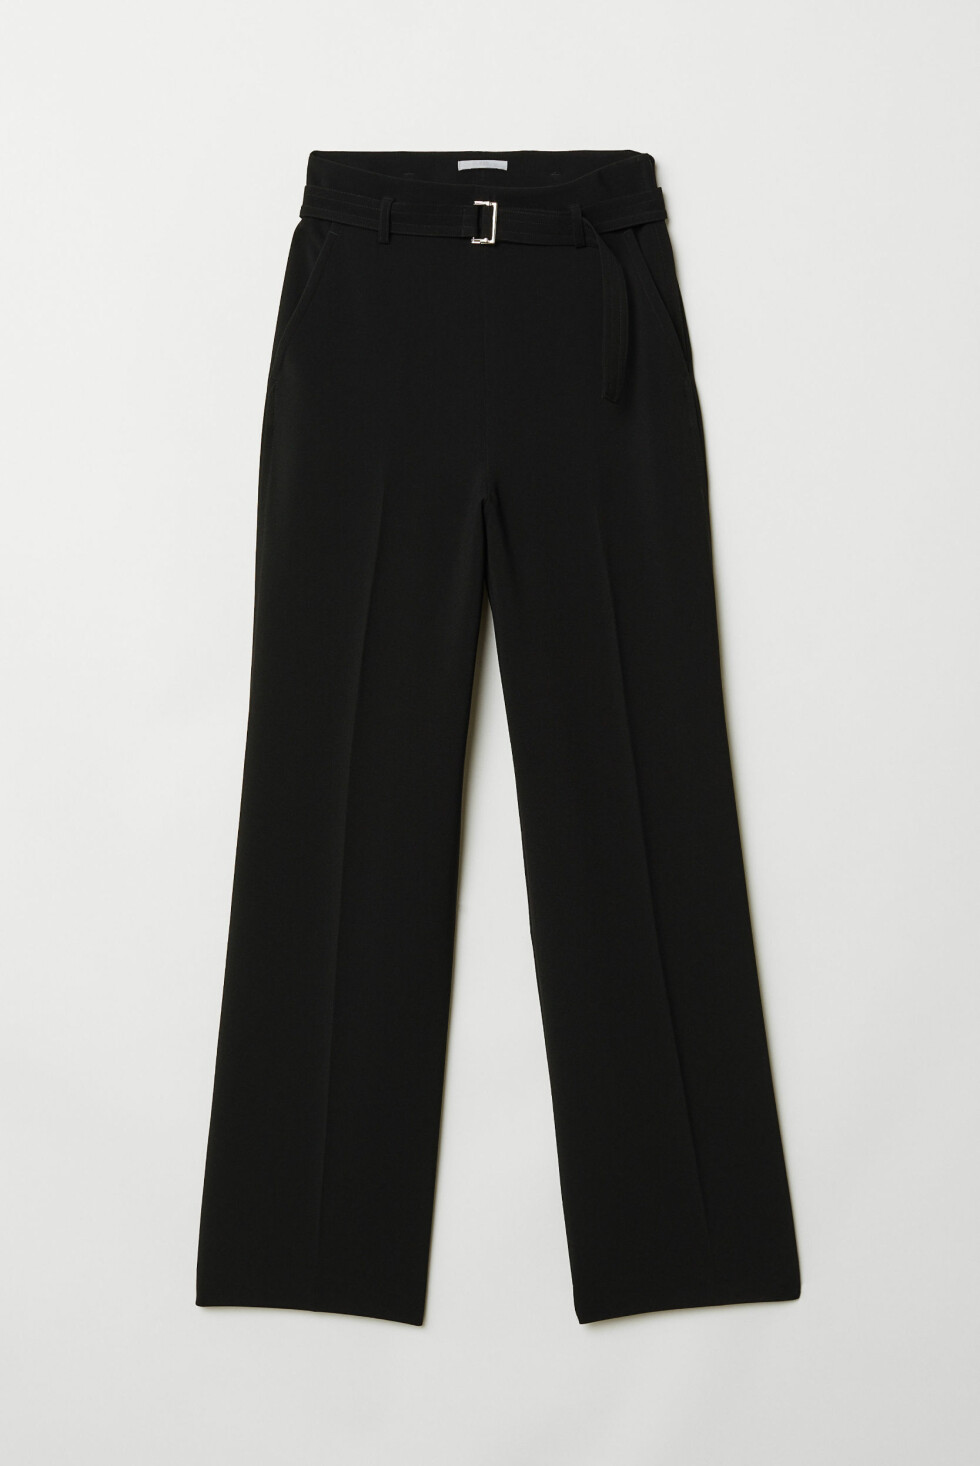 Bukse fra H&M |400,-| https://www2.hm.com/no_no/productpage.0687535001.html